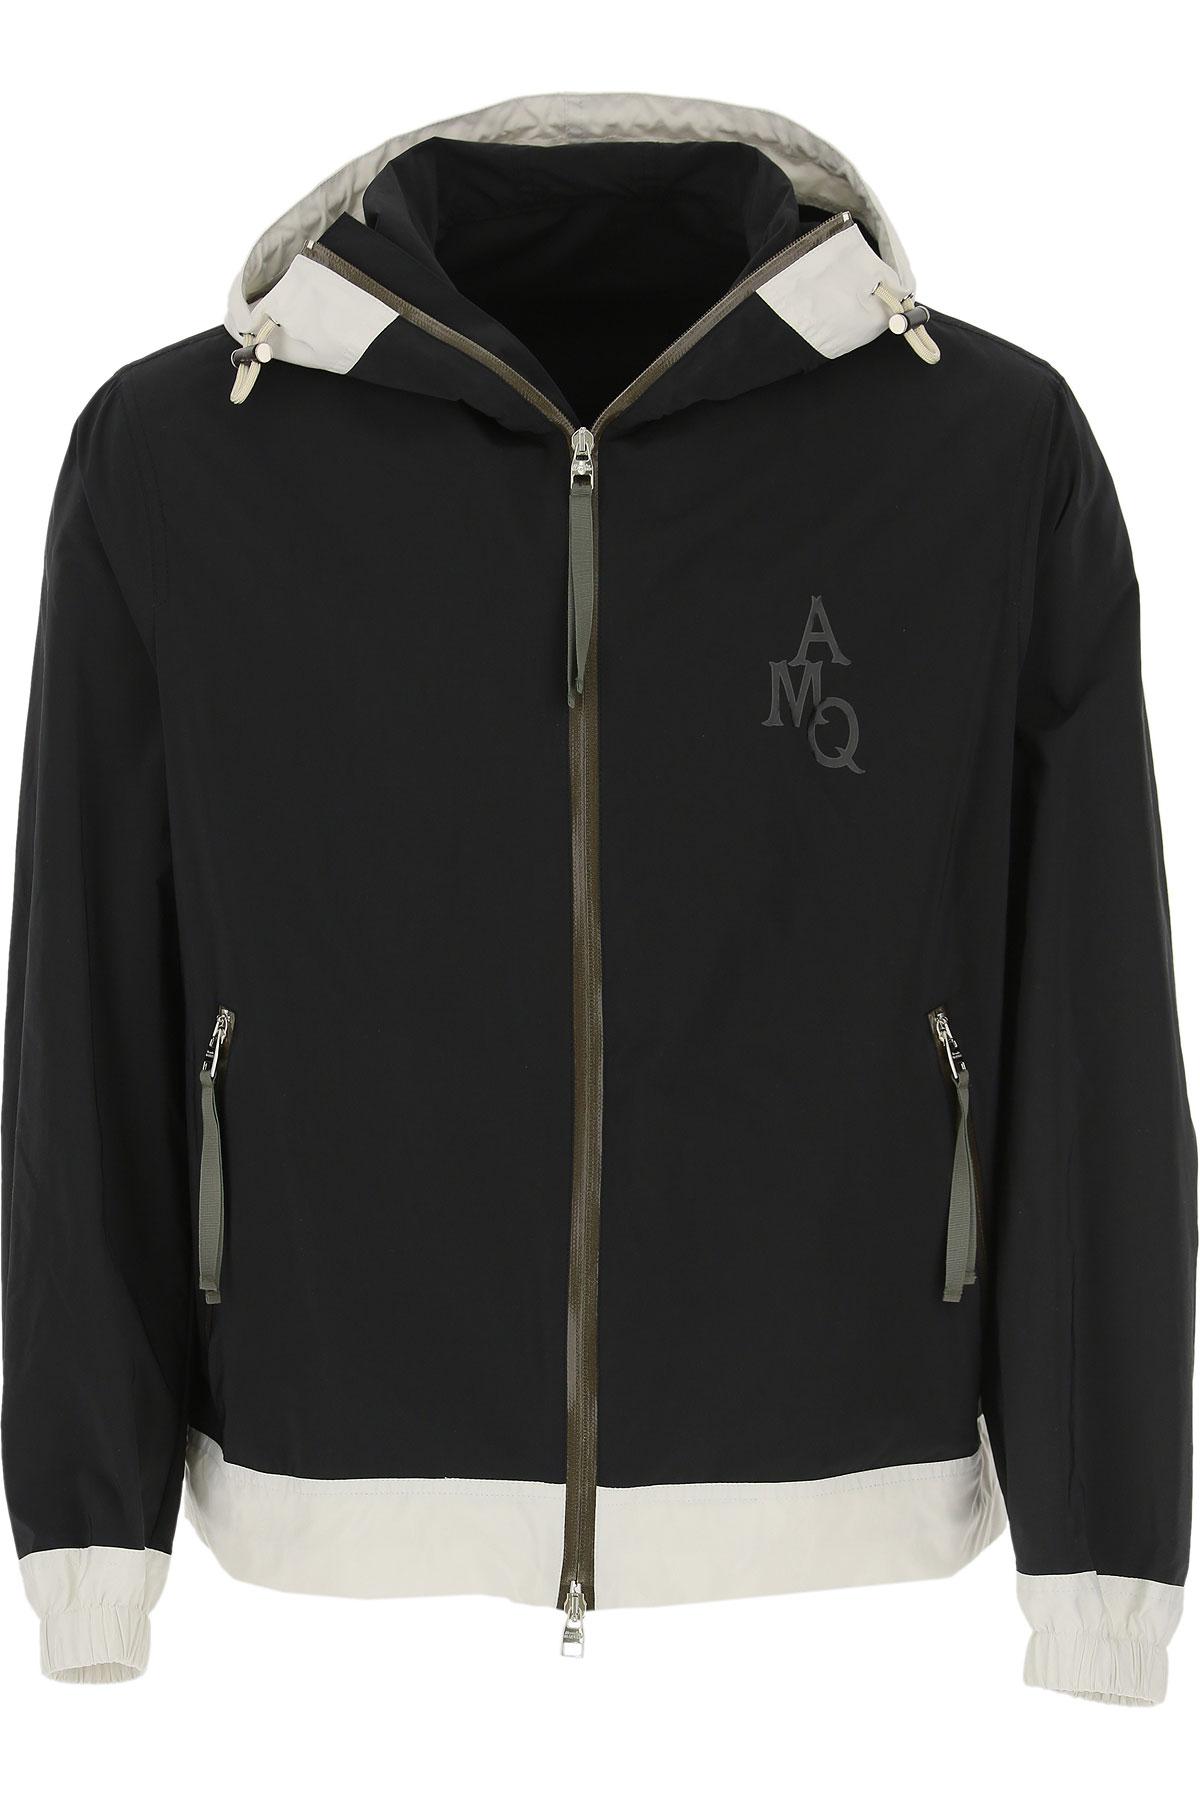 Alexander McQueen Jacket for Men On Sale, Black, polyester, 2019, L M XL